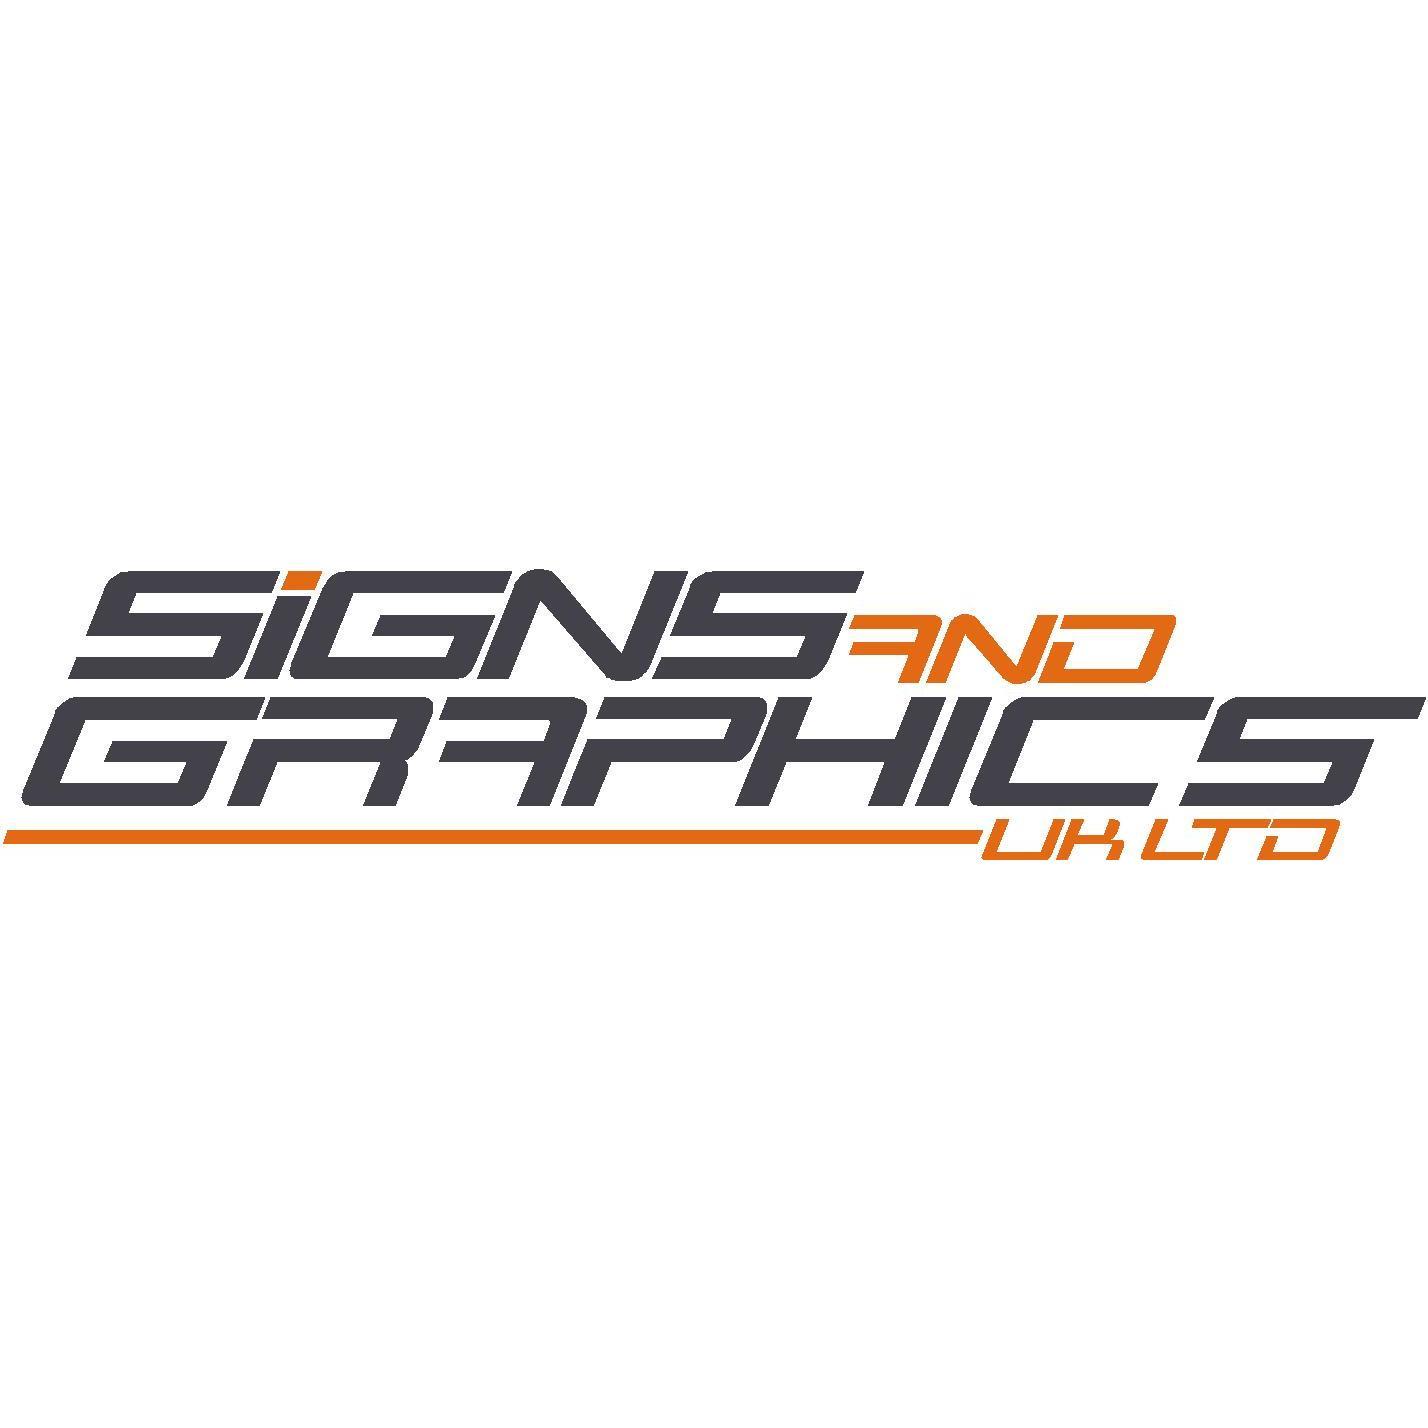 Signs & Graphics (UK) Ltd - Hinckley, Leicestershire LE10 3AH - 01455 612706 | ShowMeLocal.com